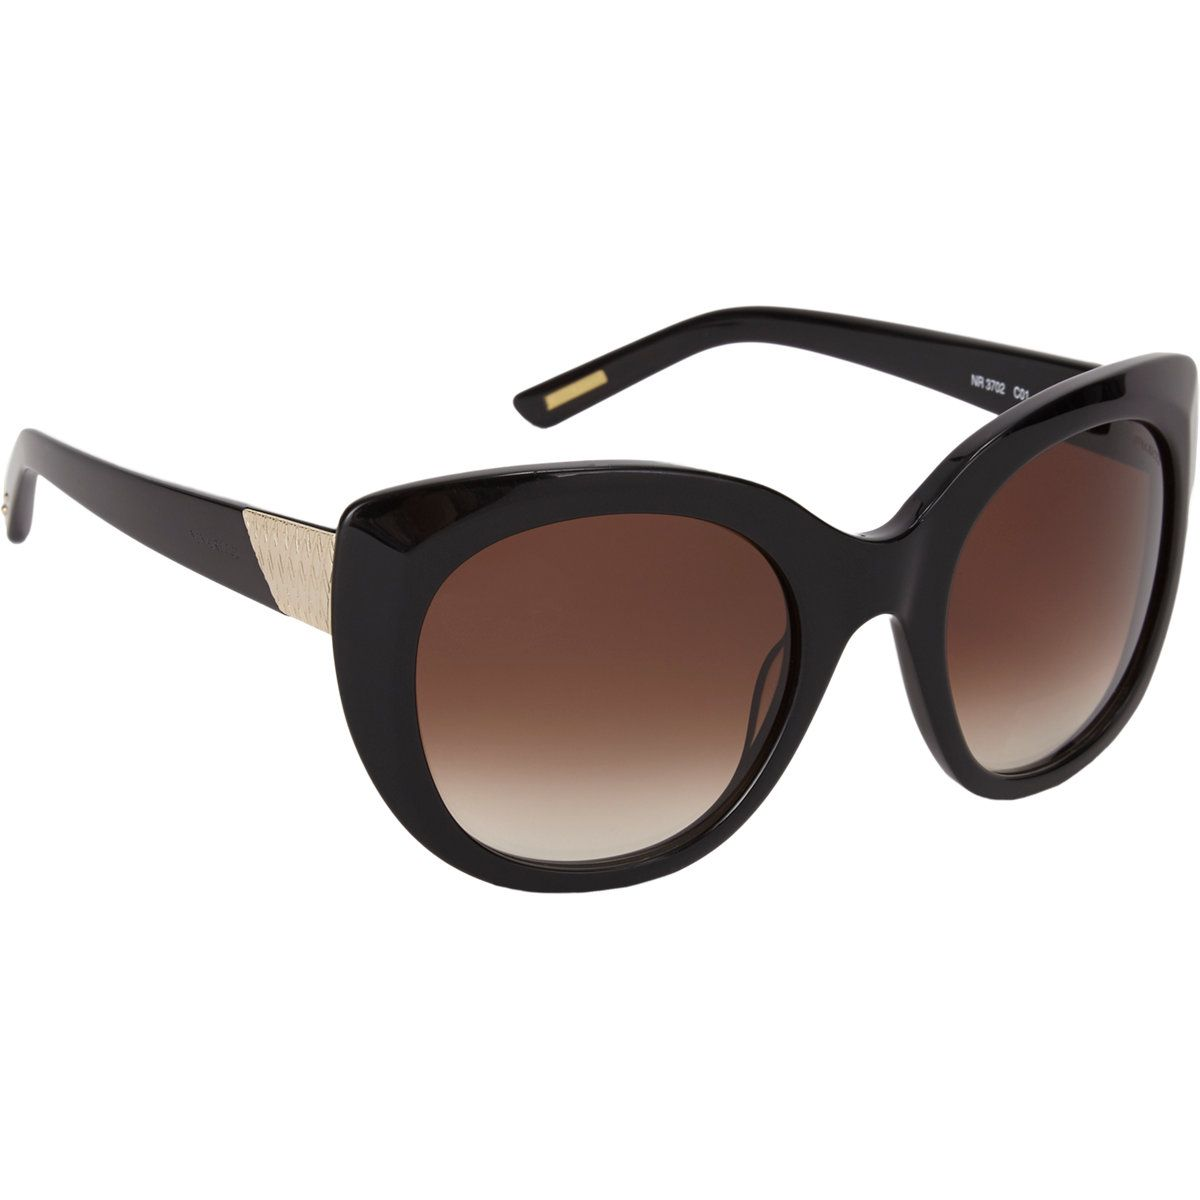 Nina Ricci Oversized Cat-Eye Sunglasses